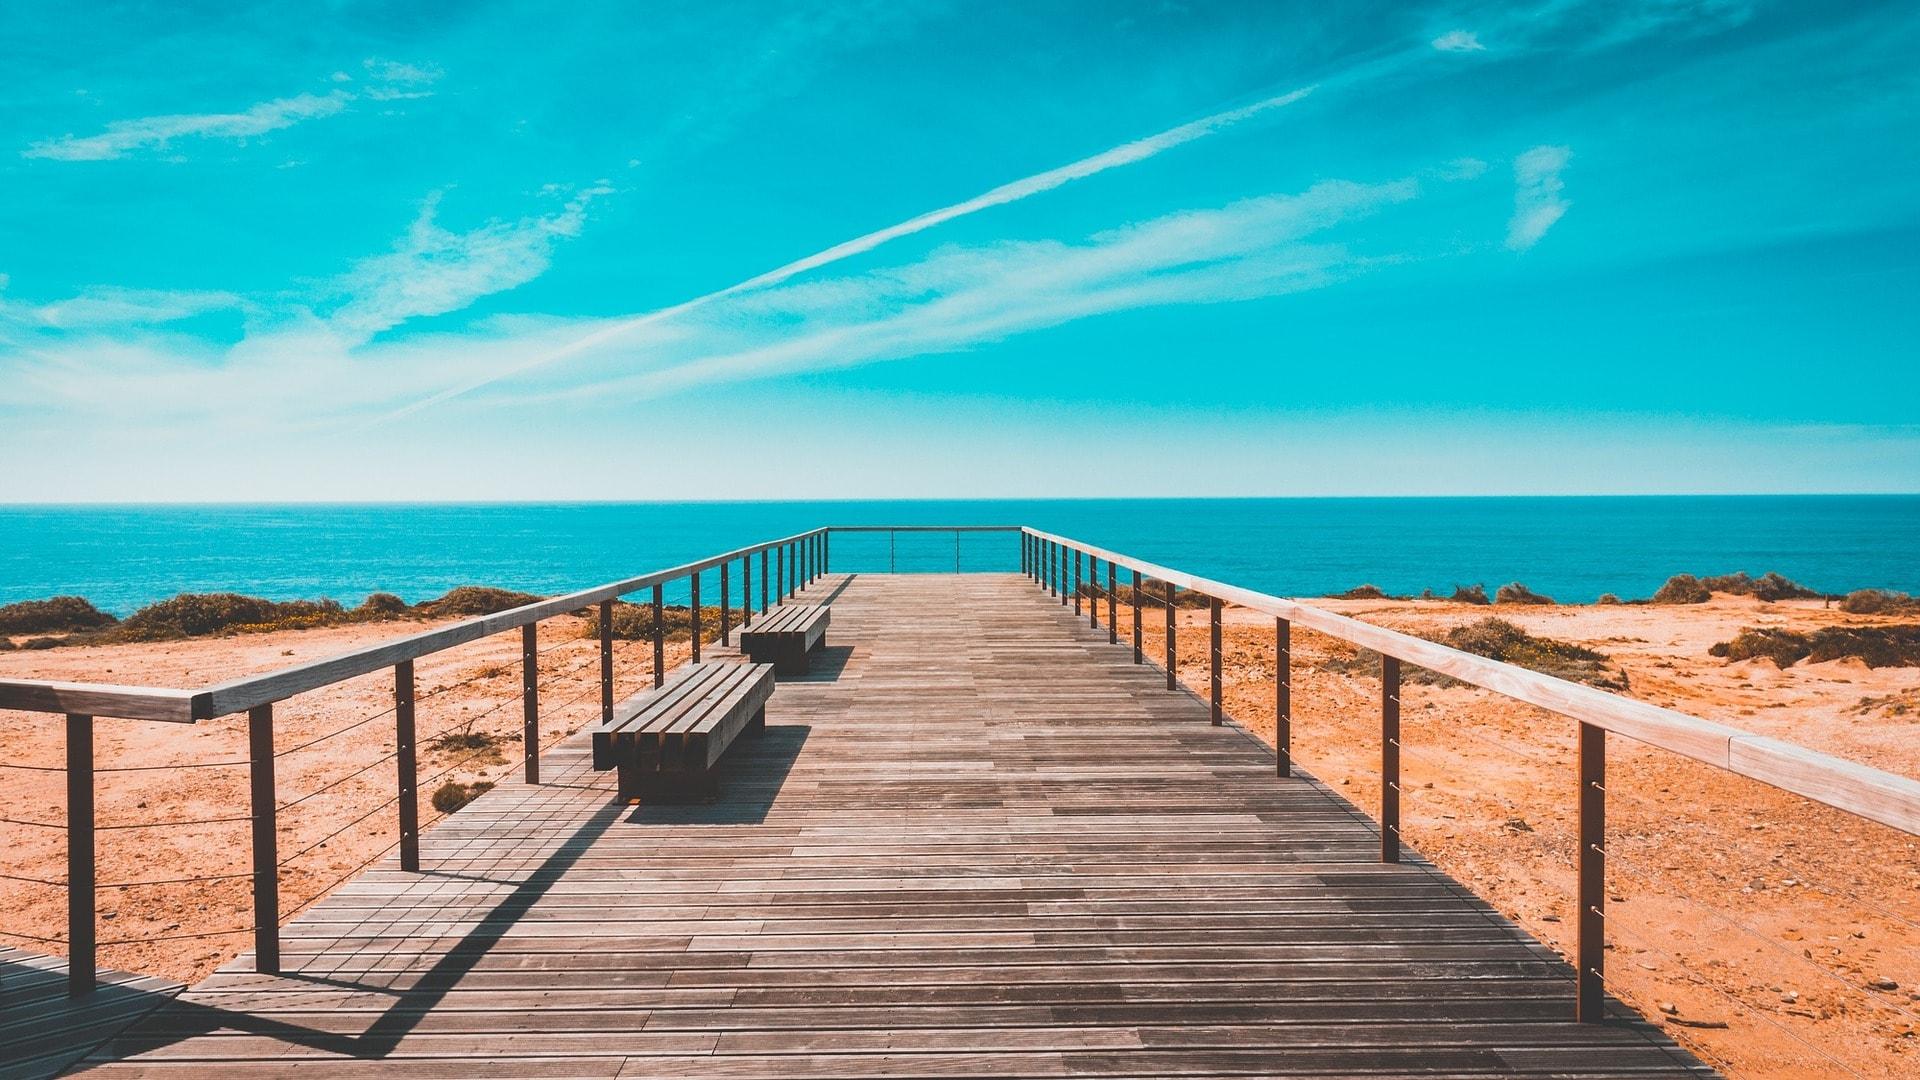 portugal-algarve- beach-investor- visa- opportunity-min